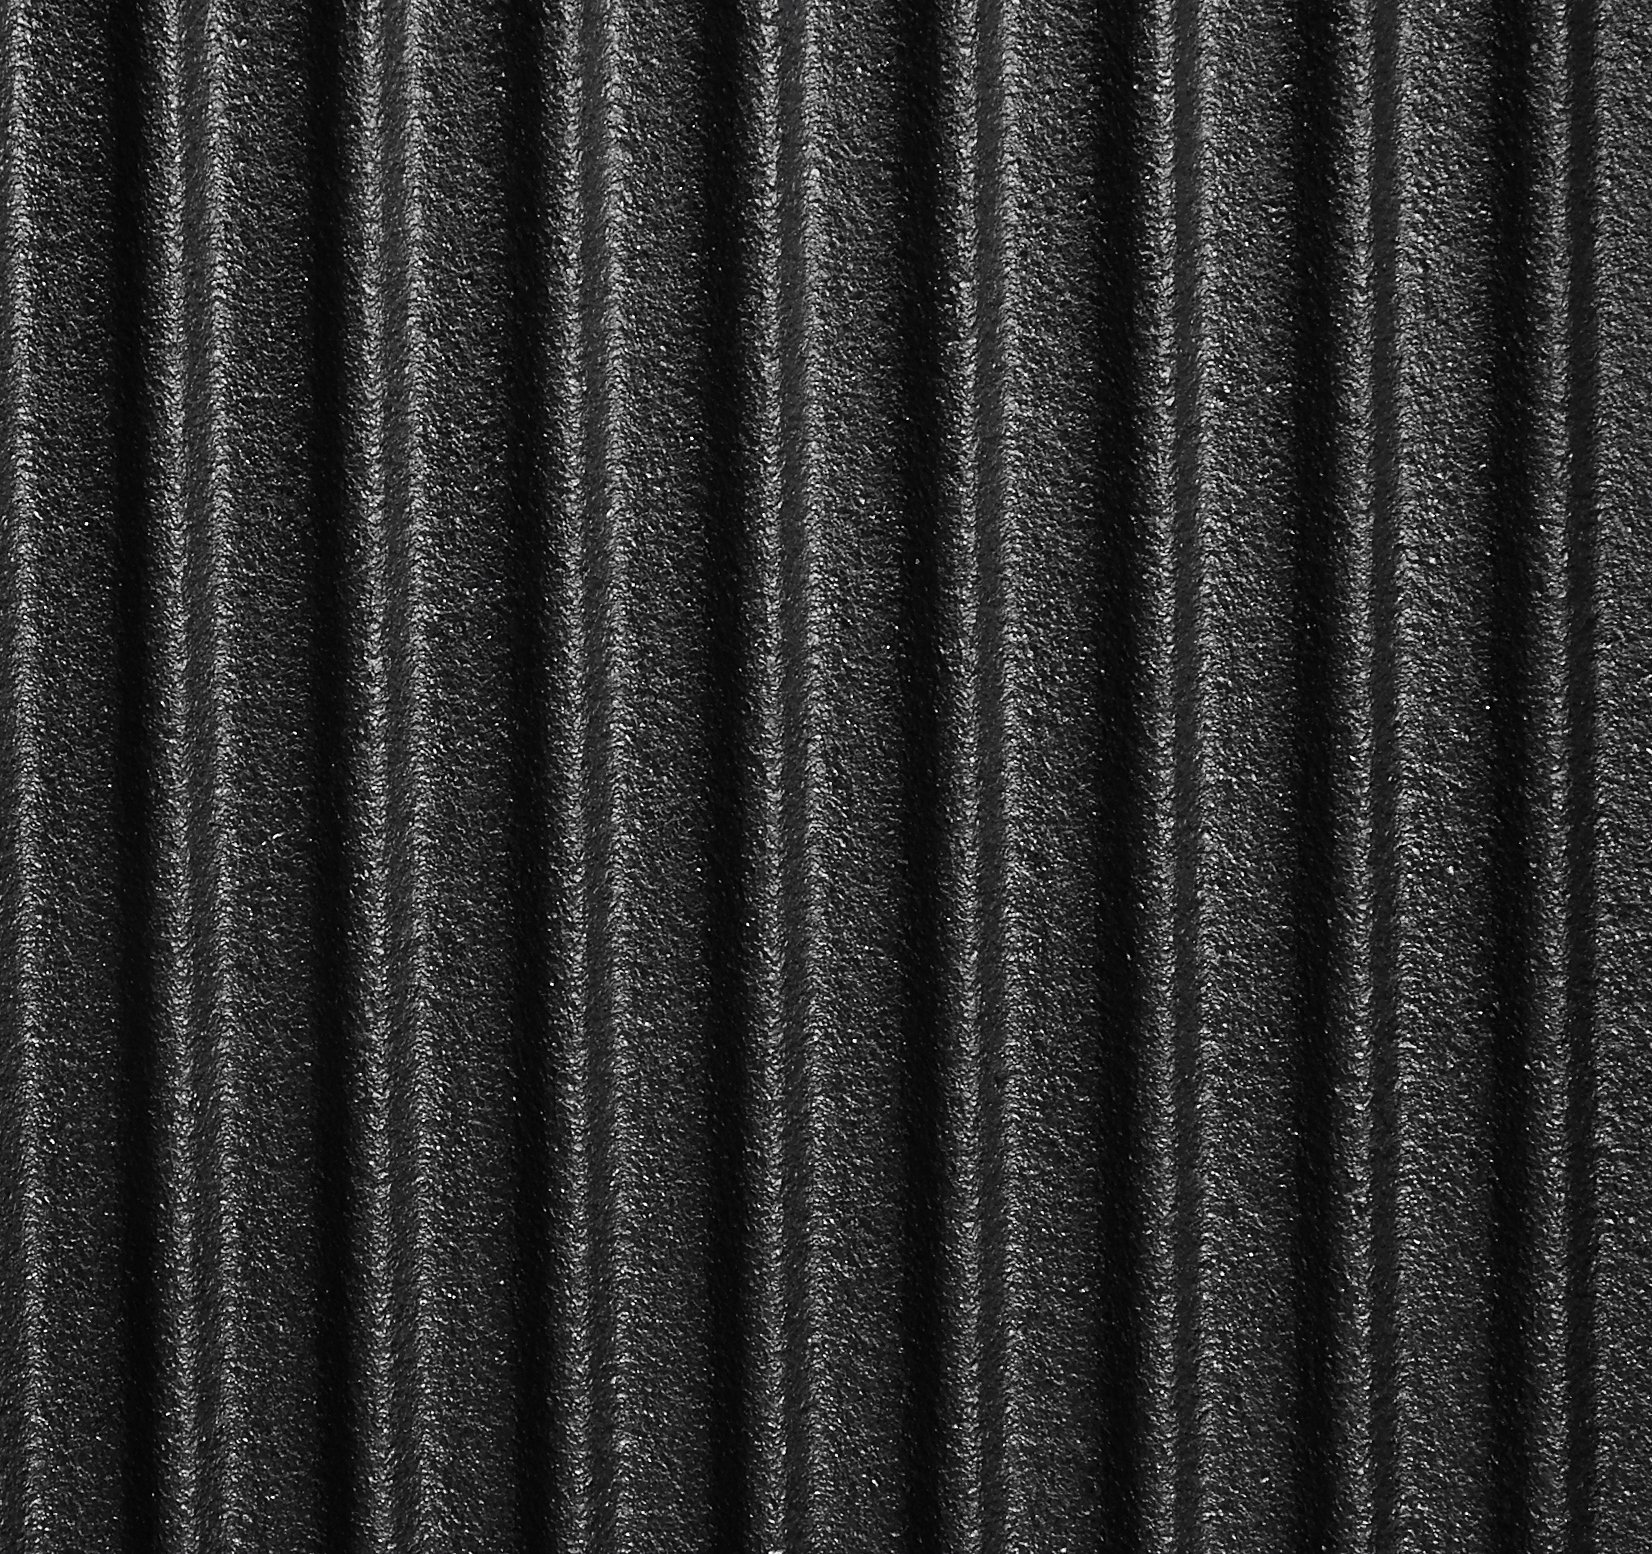 AmazonBasics Pre-Seasoned Cast Iron Square Grill Pan - 10.25-Inch by AmazonBasics (Image #2)